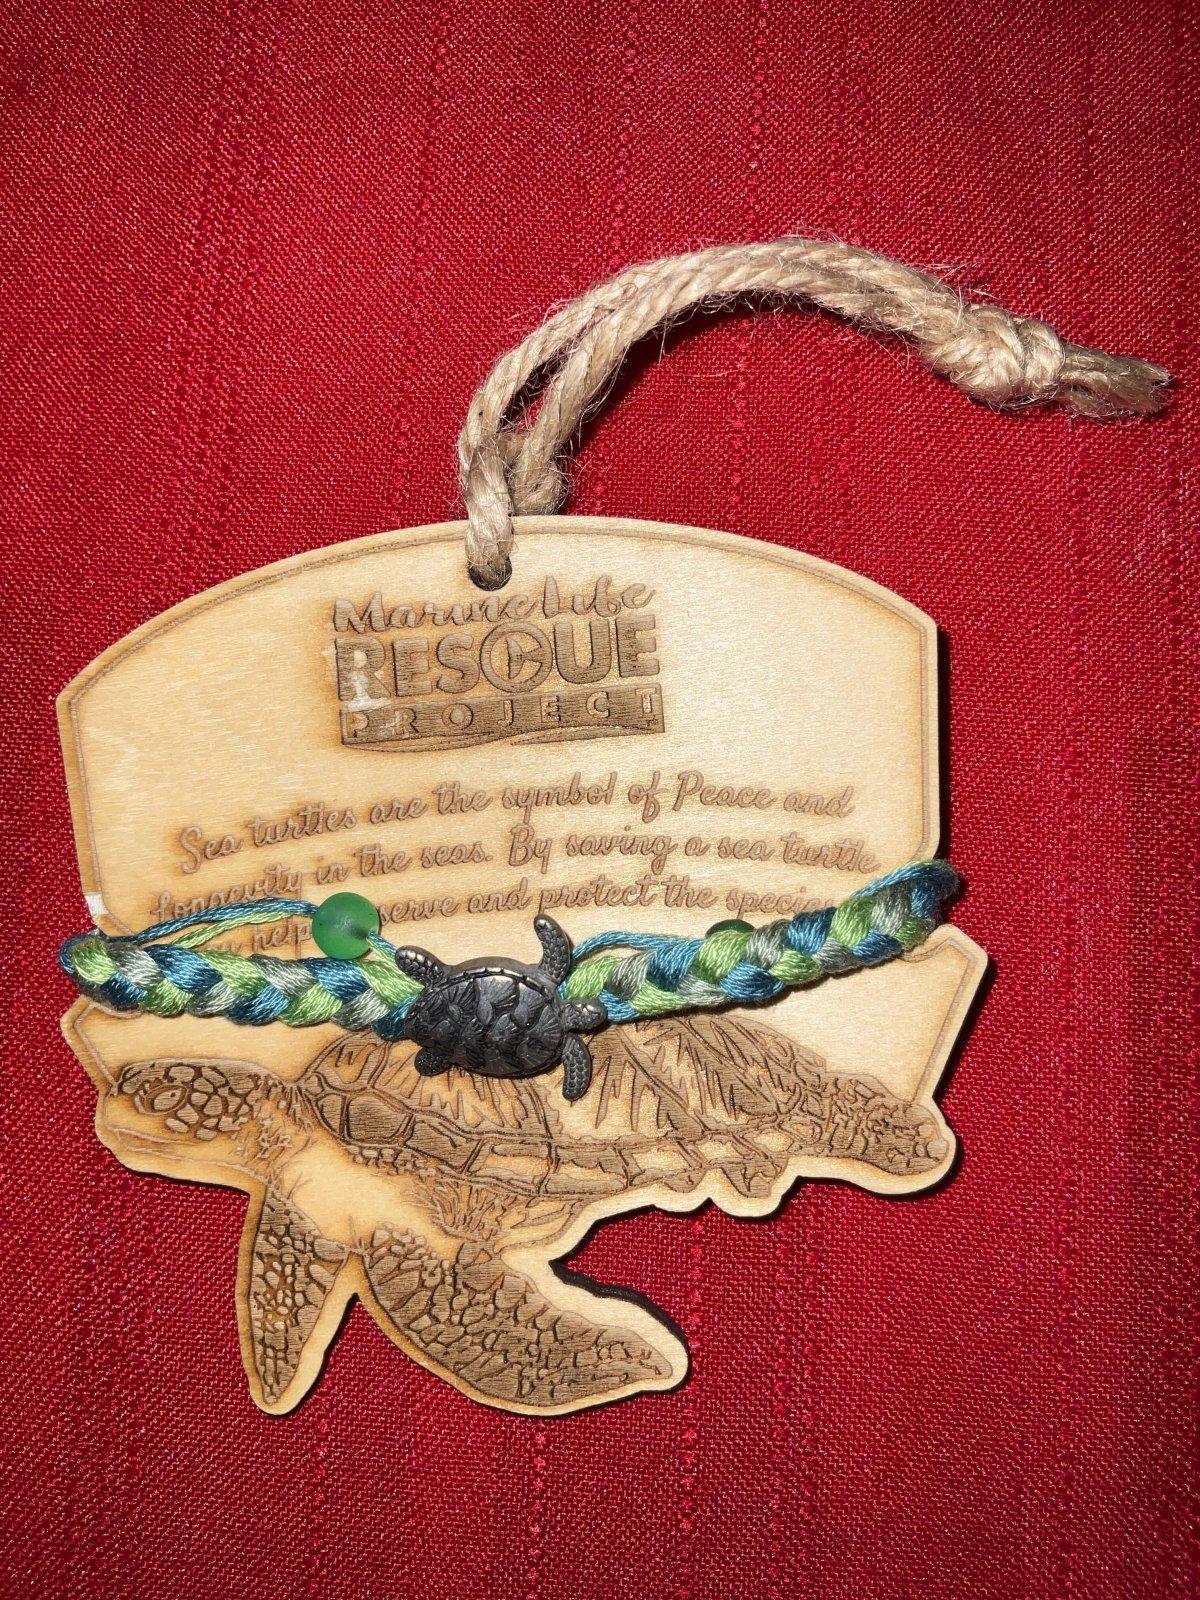 Marine Life Rescue Bracelet w/ Turtle Ornament